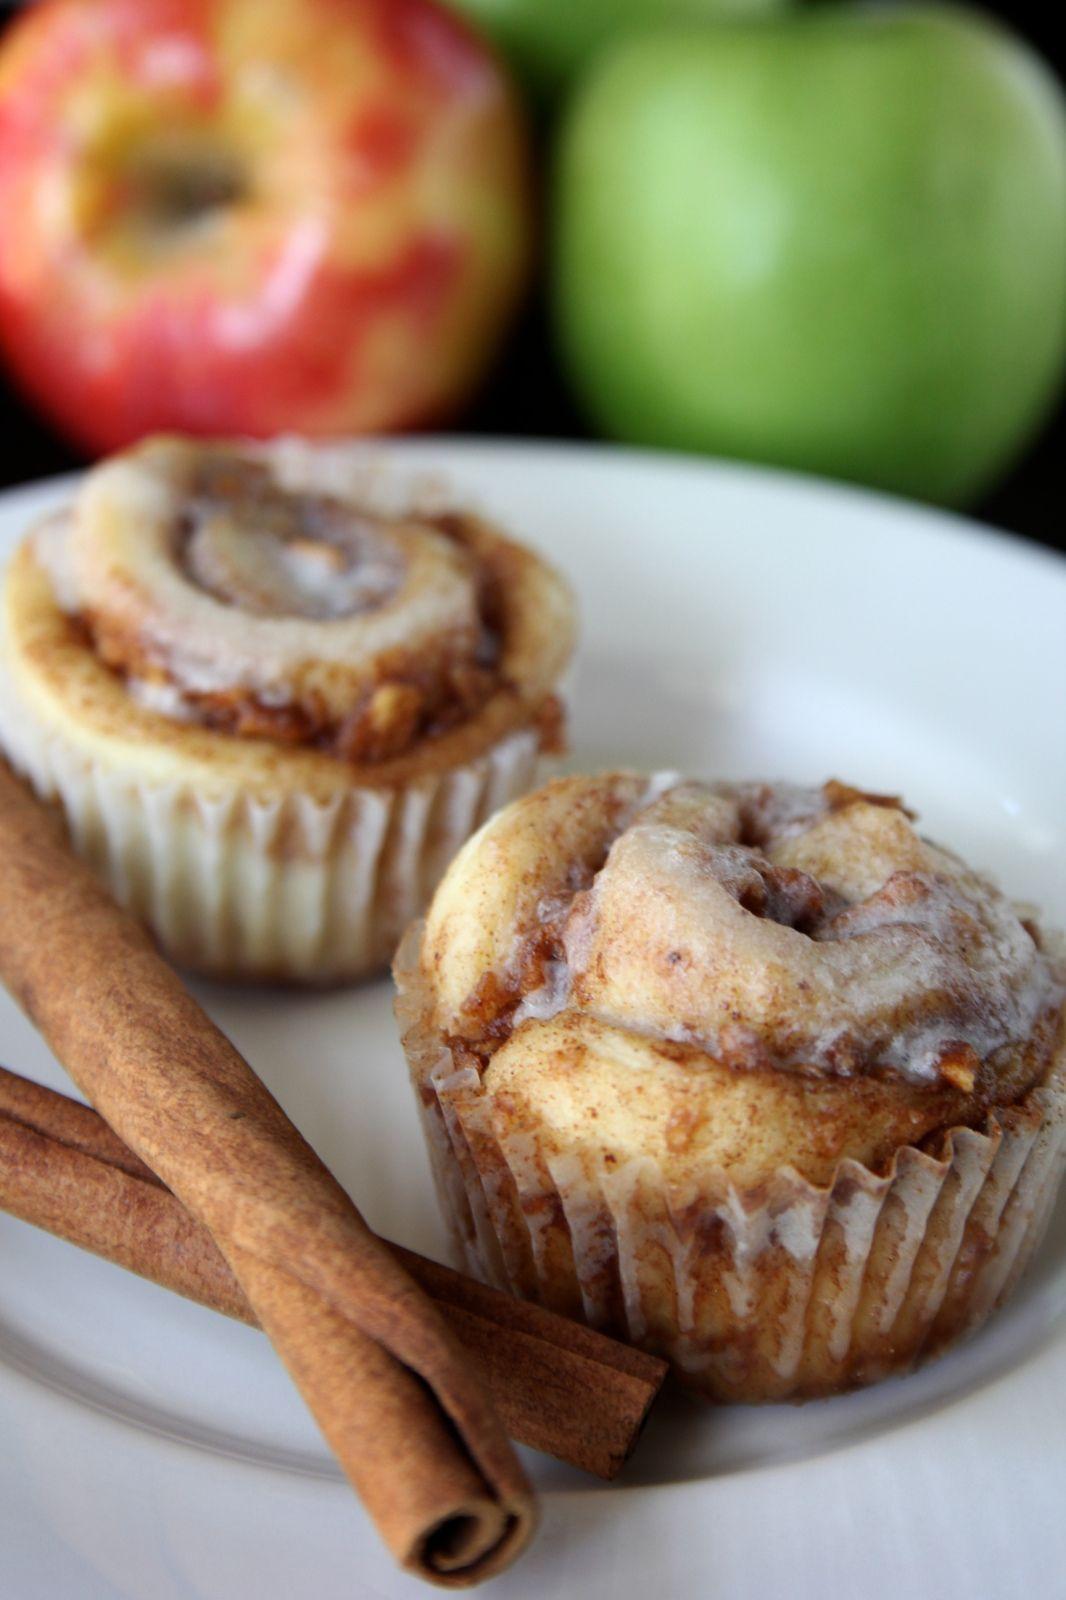 Apple Cinnamon Roll Muffins